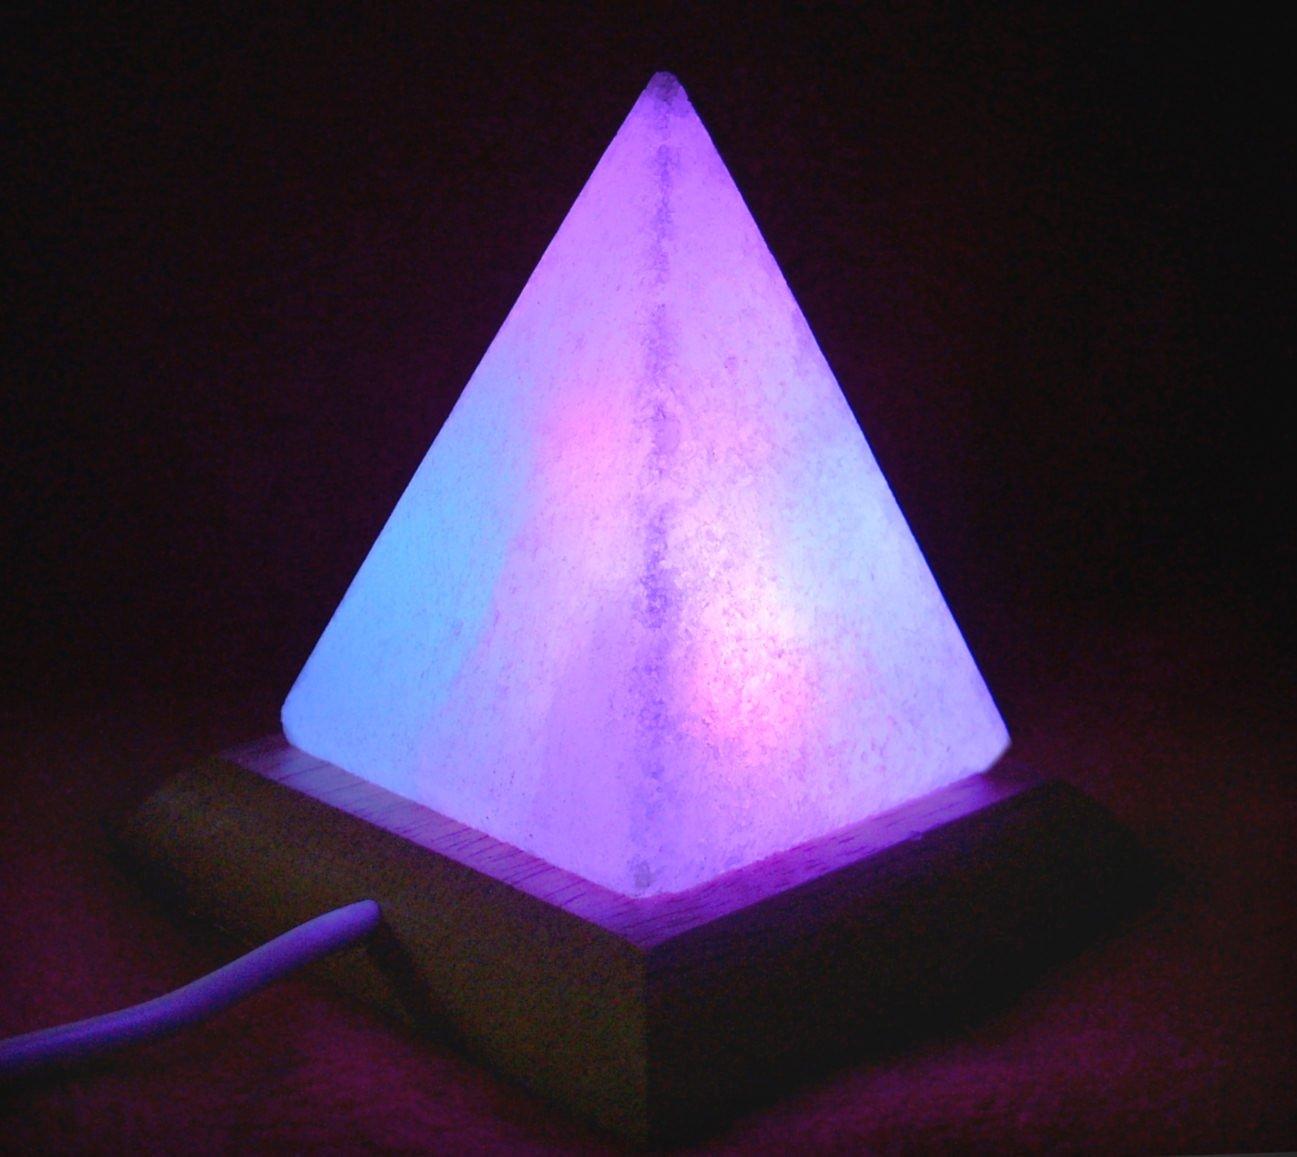 USB Pyramid Himalayan Salt Desk Lamp Multi Coloured: Amazon.co.uk ... for Purple Salt Lamp  193tgx